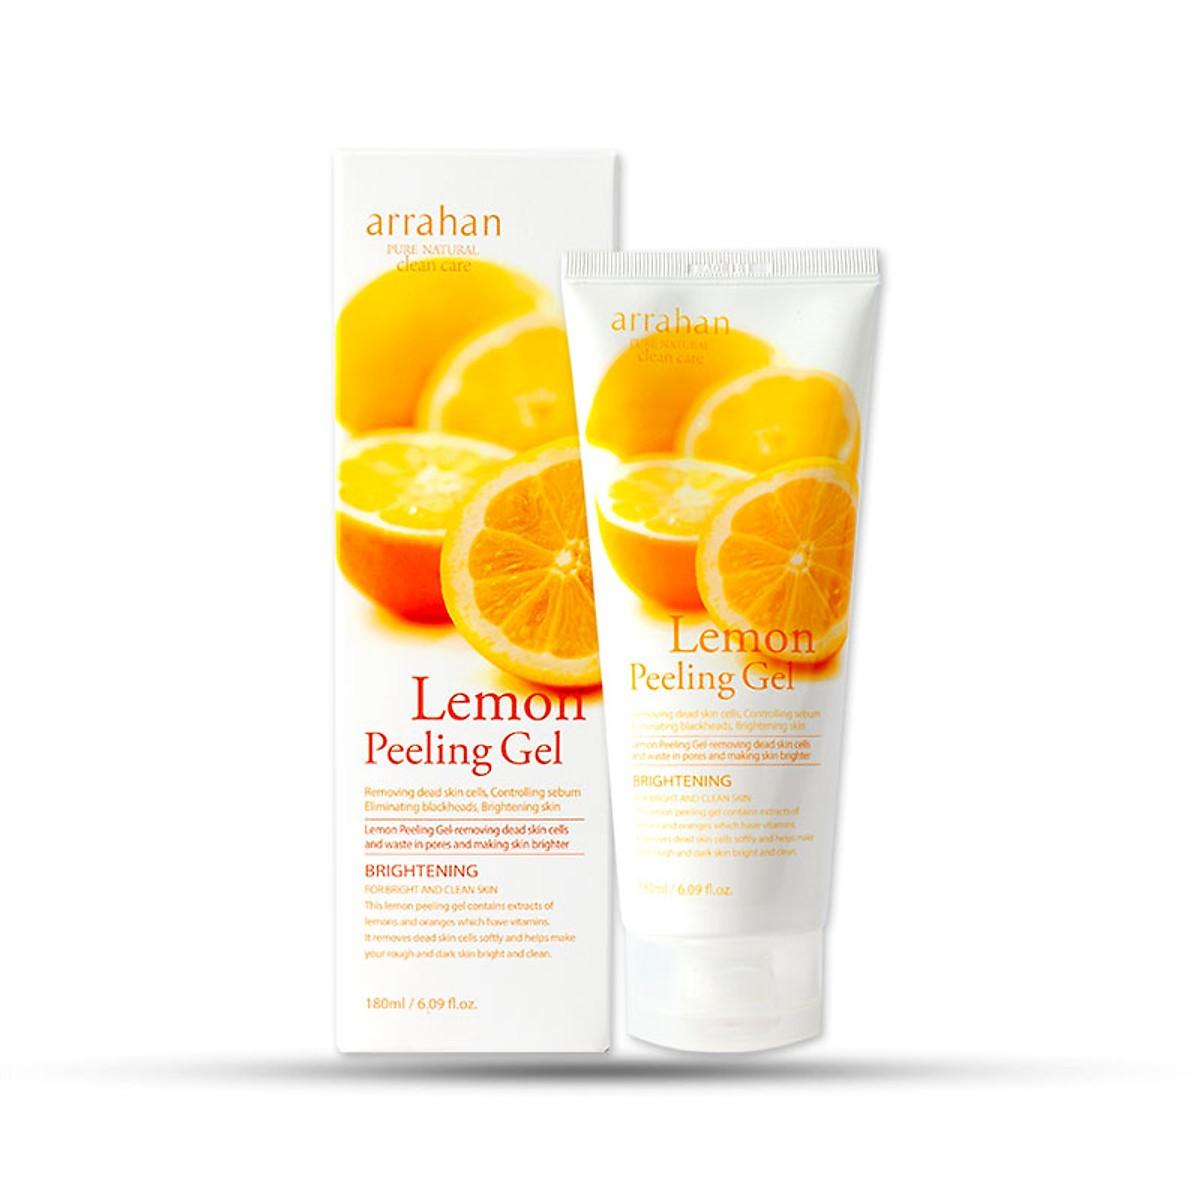 Kem Tẩy Tế Bào Chết Và Làm Mềm Da Arrahan Pure Natural Clean Care Lemon Peeling  Gel 180ml - Tẩy tế bào chết | MuaDoTot.com